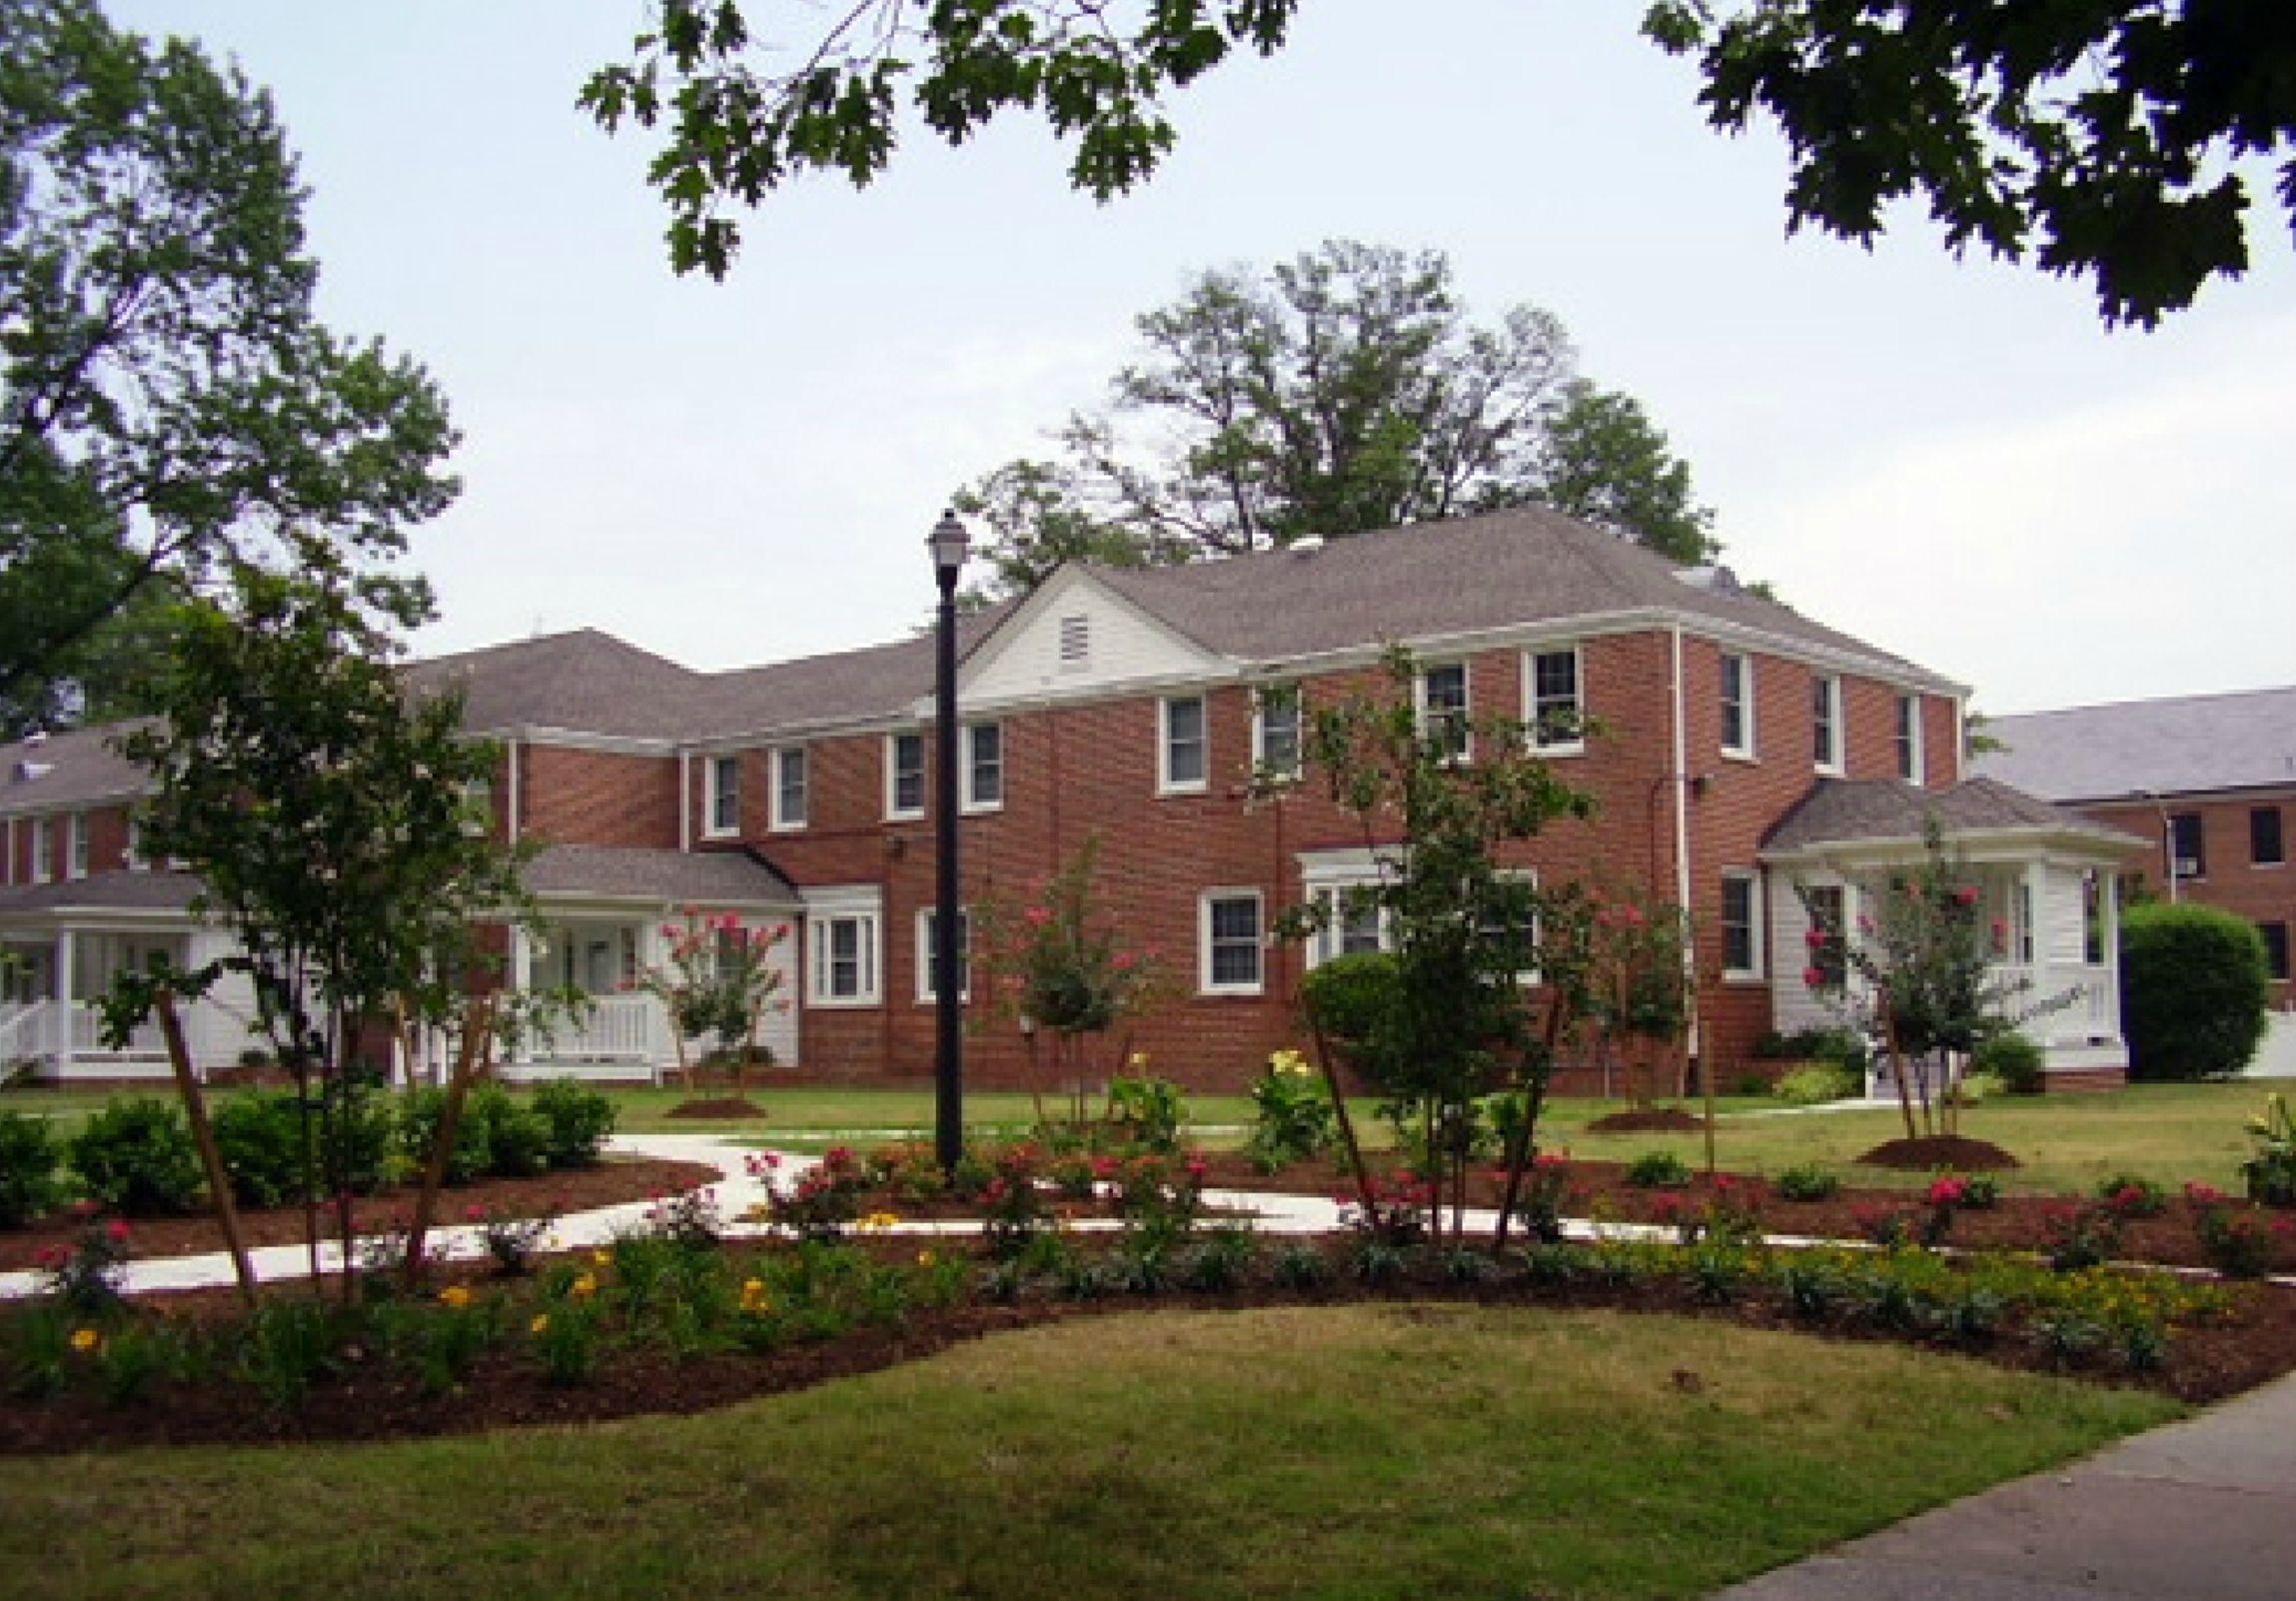 ns norfolk h quarters neighborhood 3 5 bedroom townhomes rh pinterest com